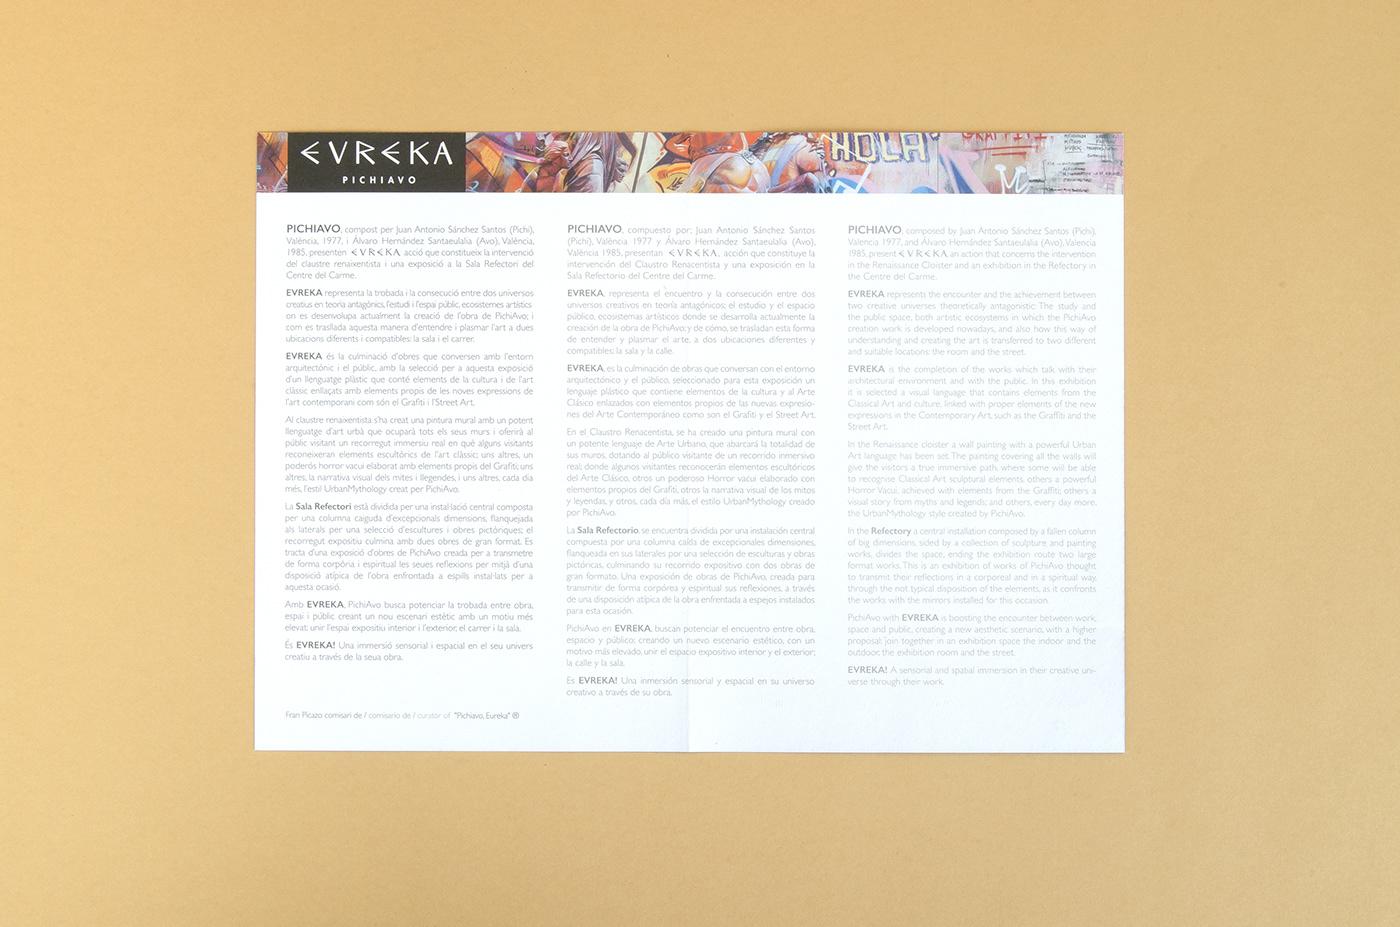 pichiavo Fallas valencia diptico Printing imprenta papel paper